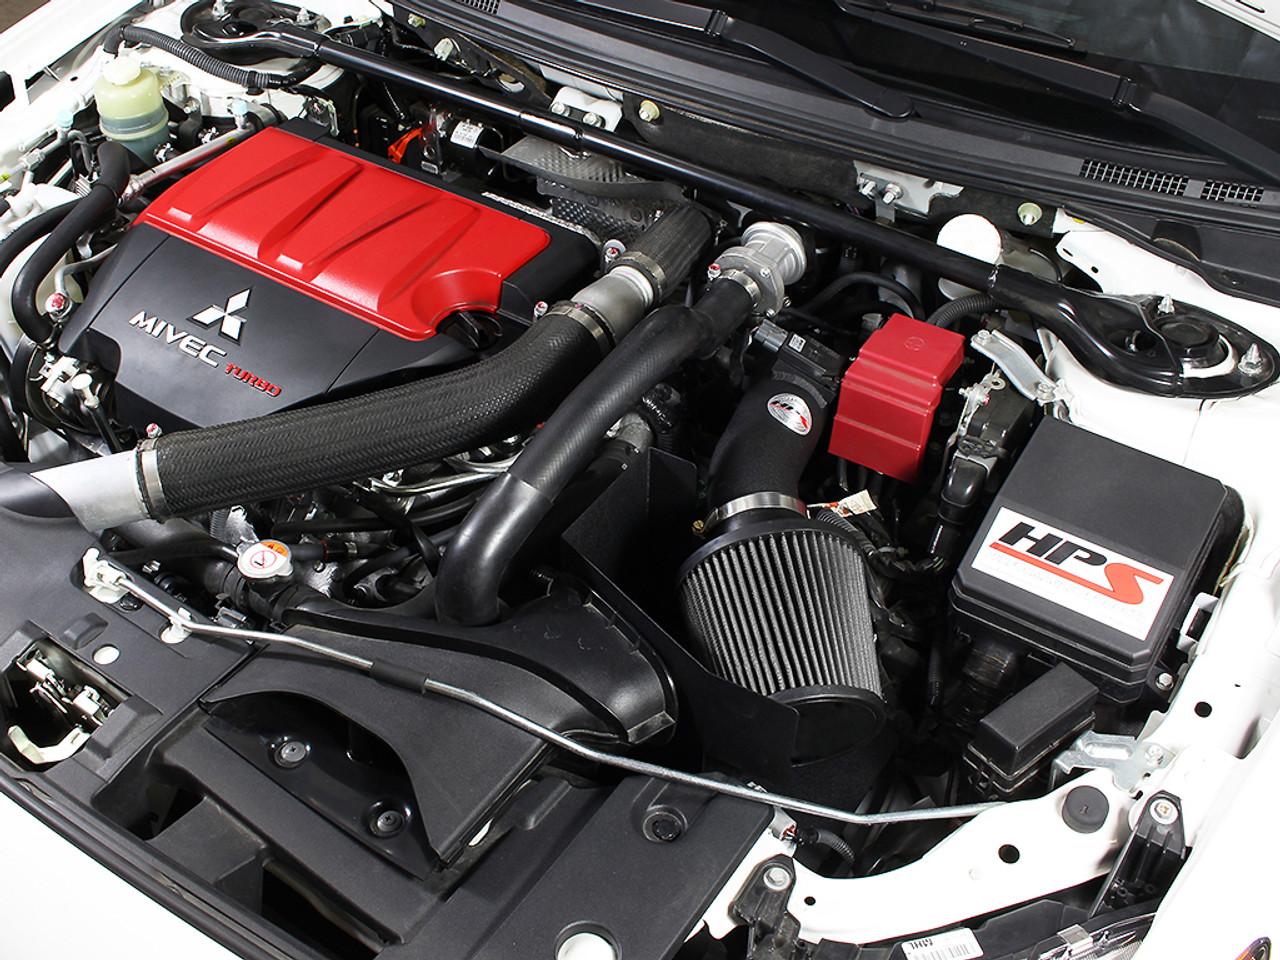 hps black shortram air intake heat shield for 08 15 mitsubishi lancer evo x turbo